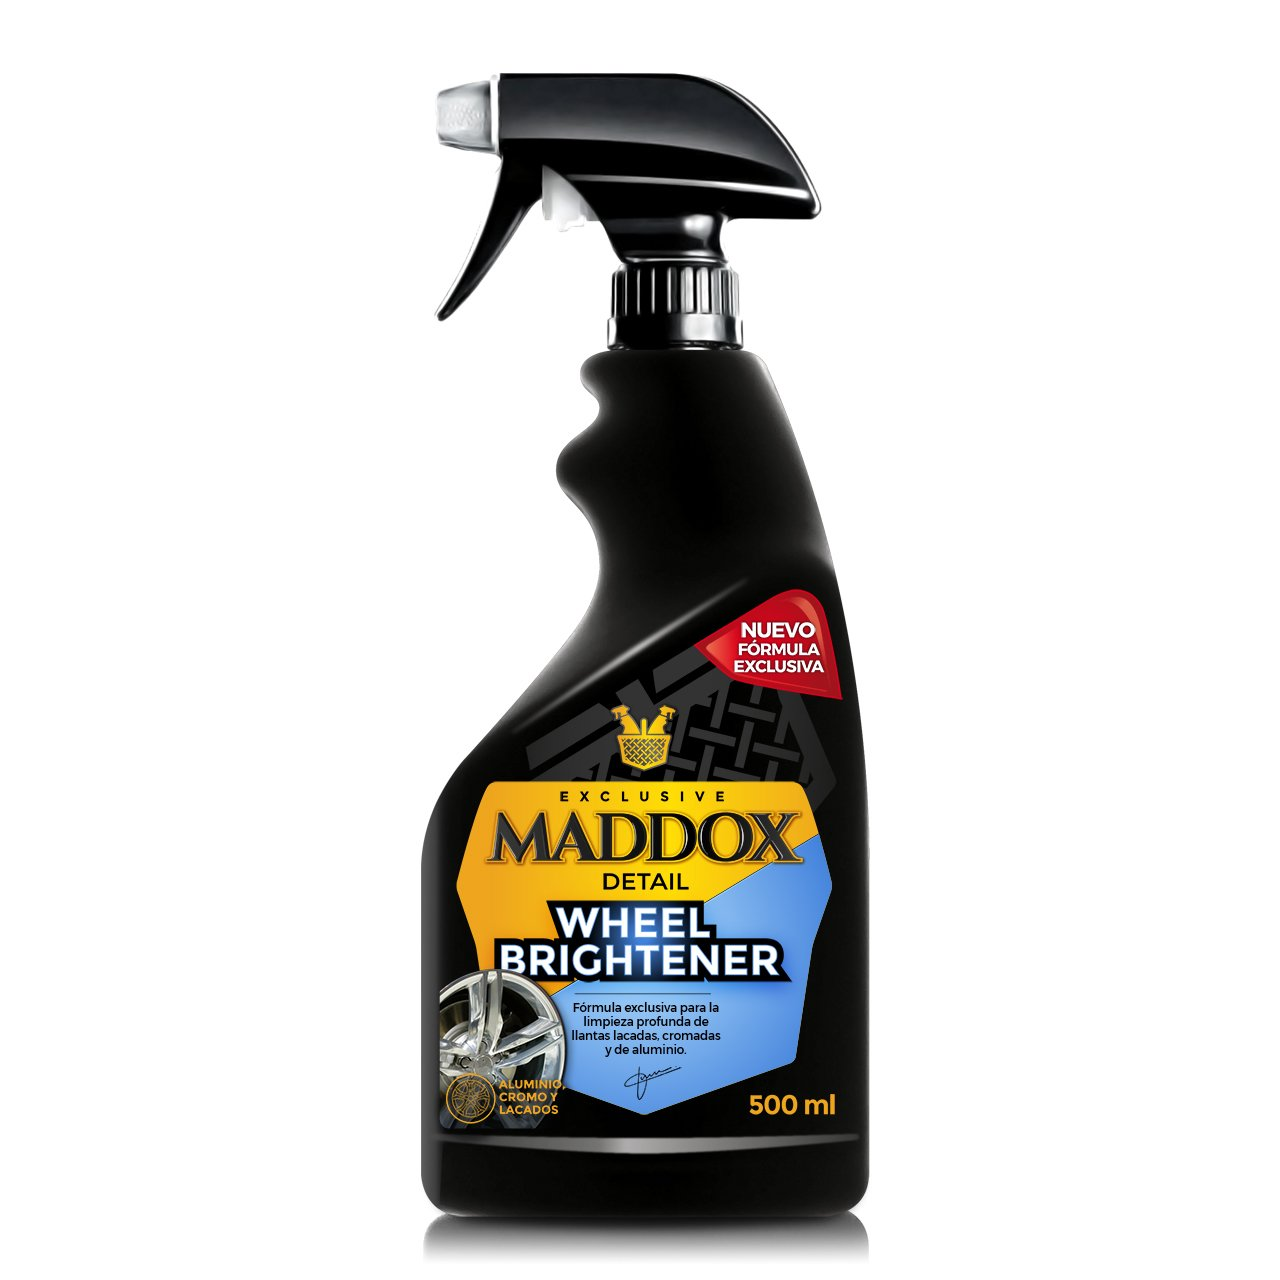 Maddox Detail- Wheel brigthtener - Pulitore Cerchi e Gomme Detergente (500 ml) Maddox Automoción S.L.